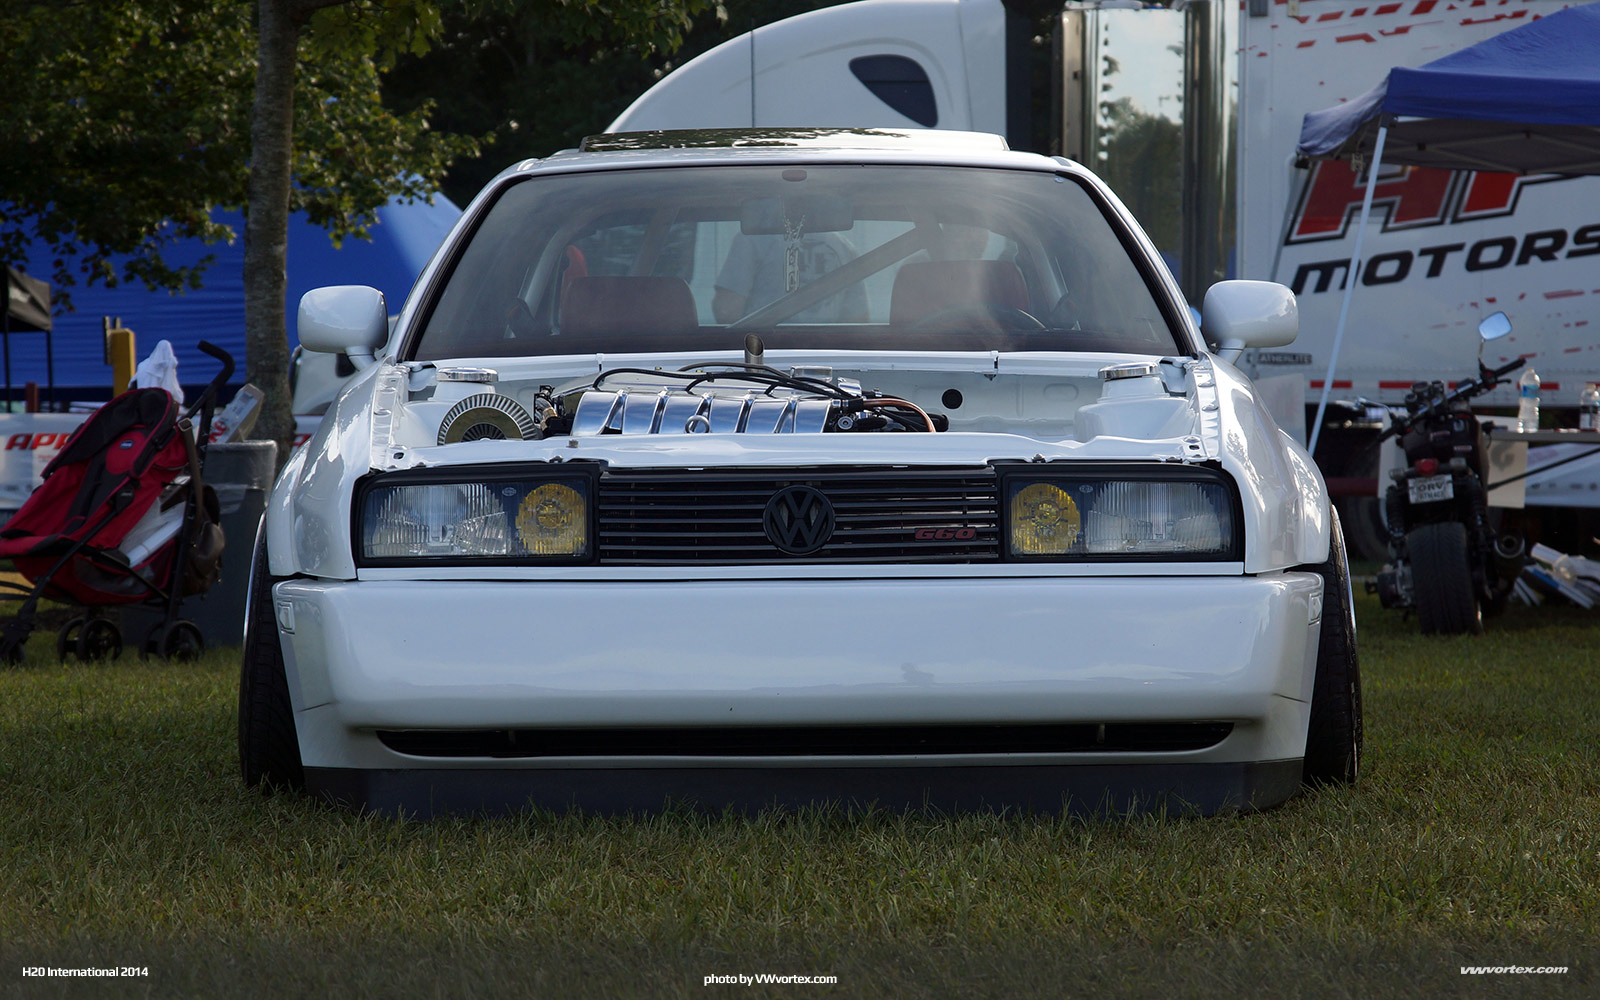 2014-H20i-H20-International-VW-Volkswagen-Audi-1139